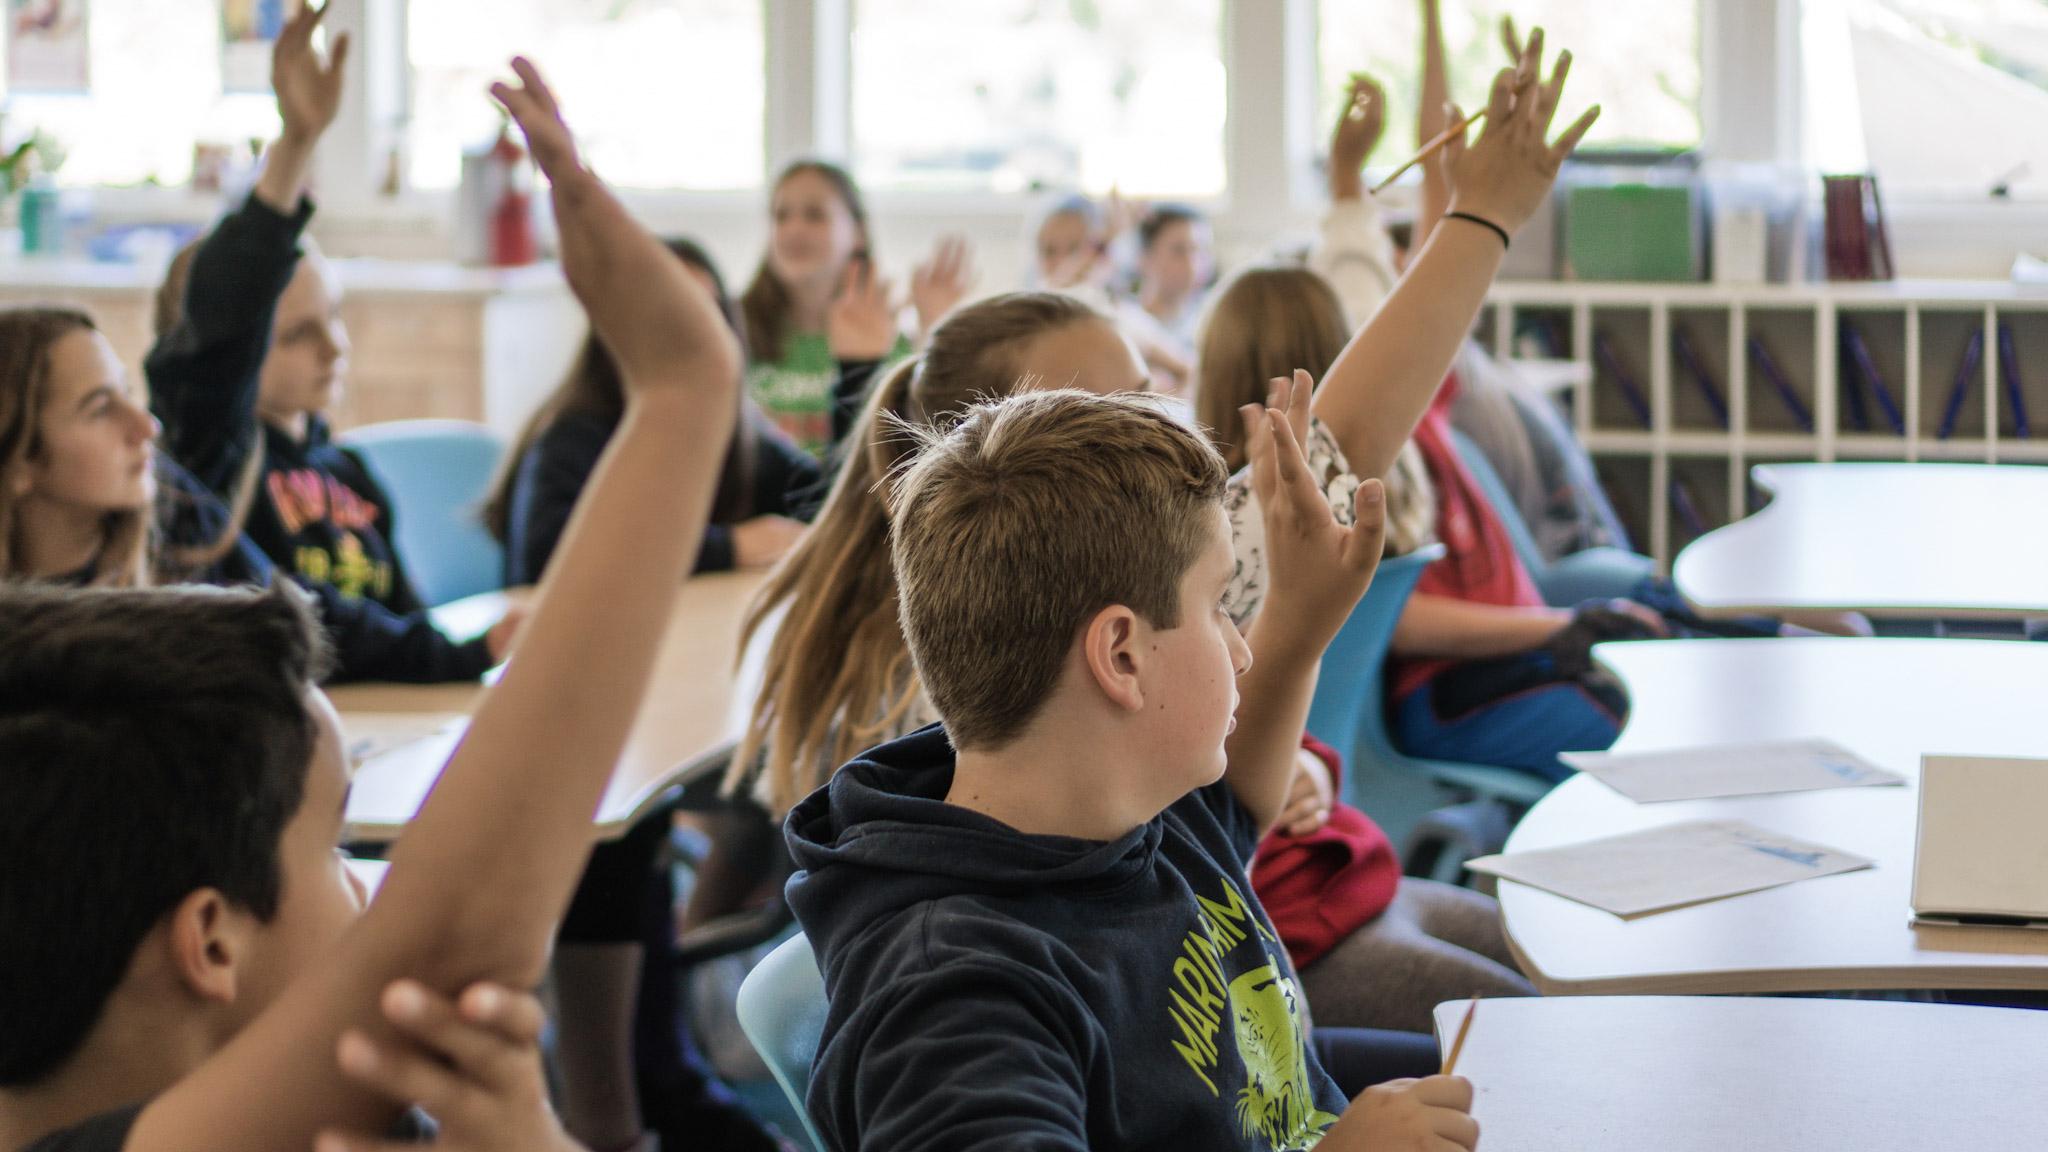 kids raising their hand in classroom.jpg